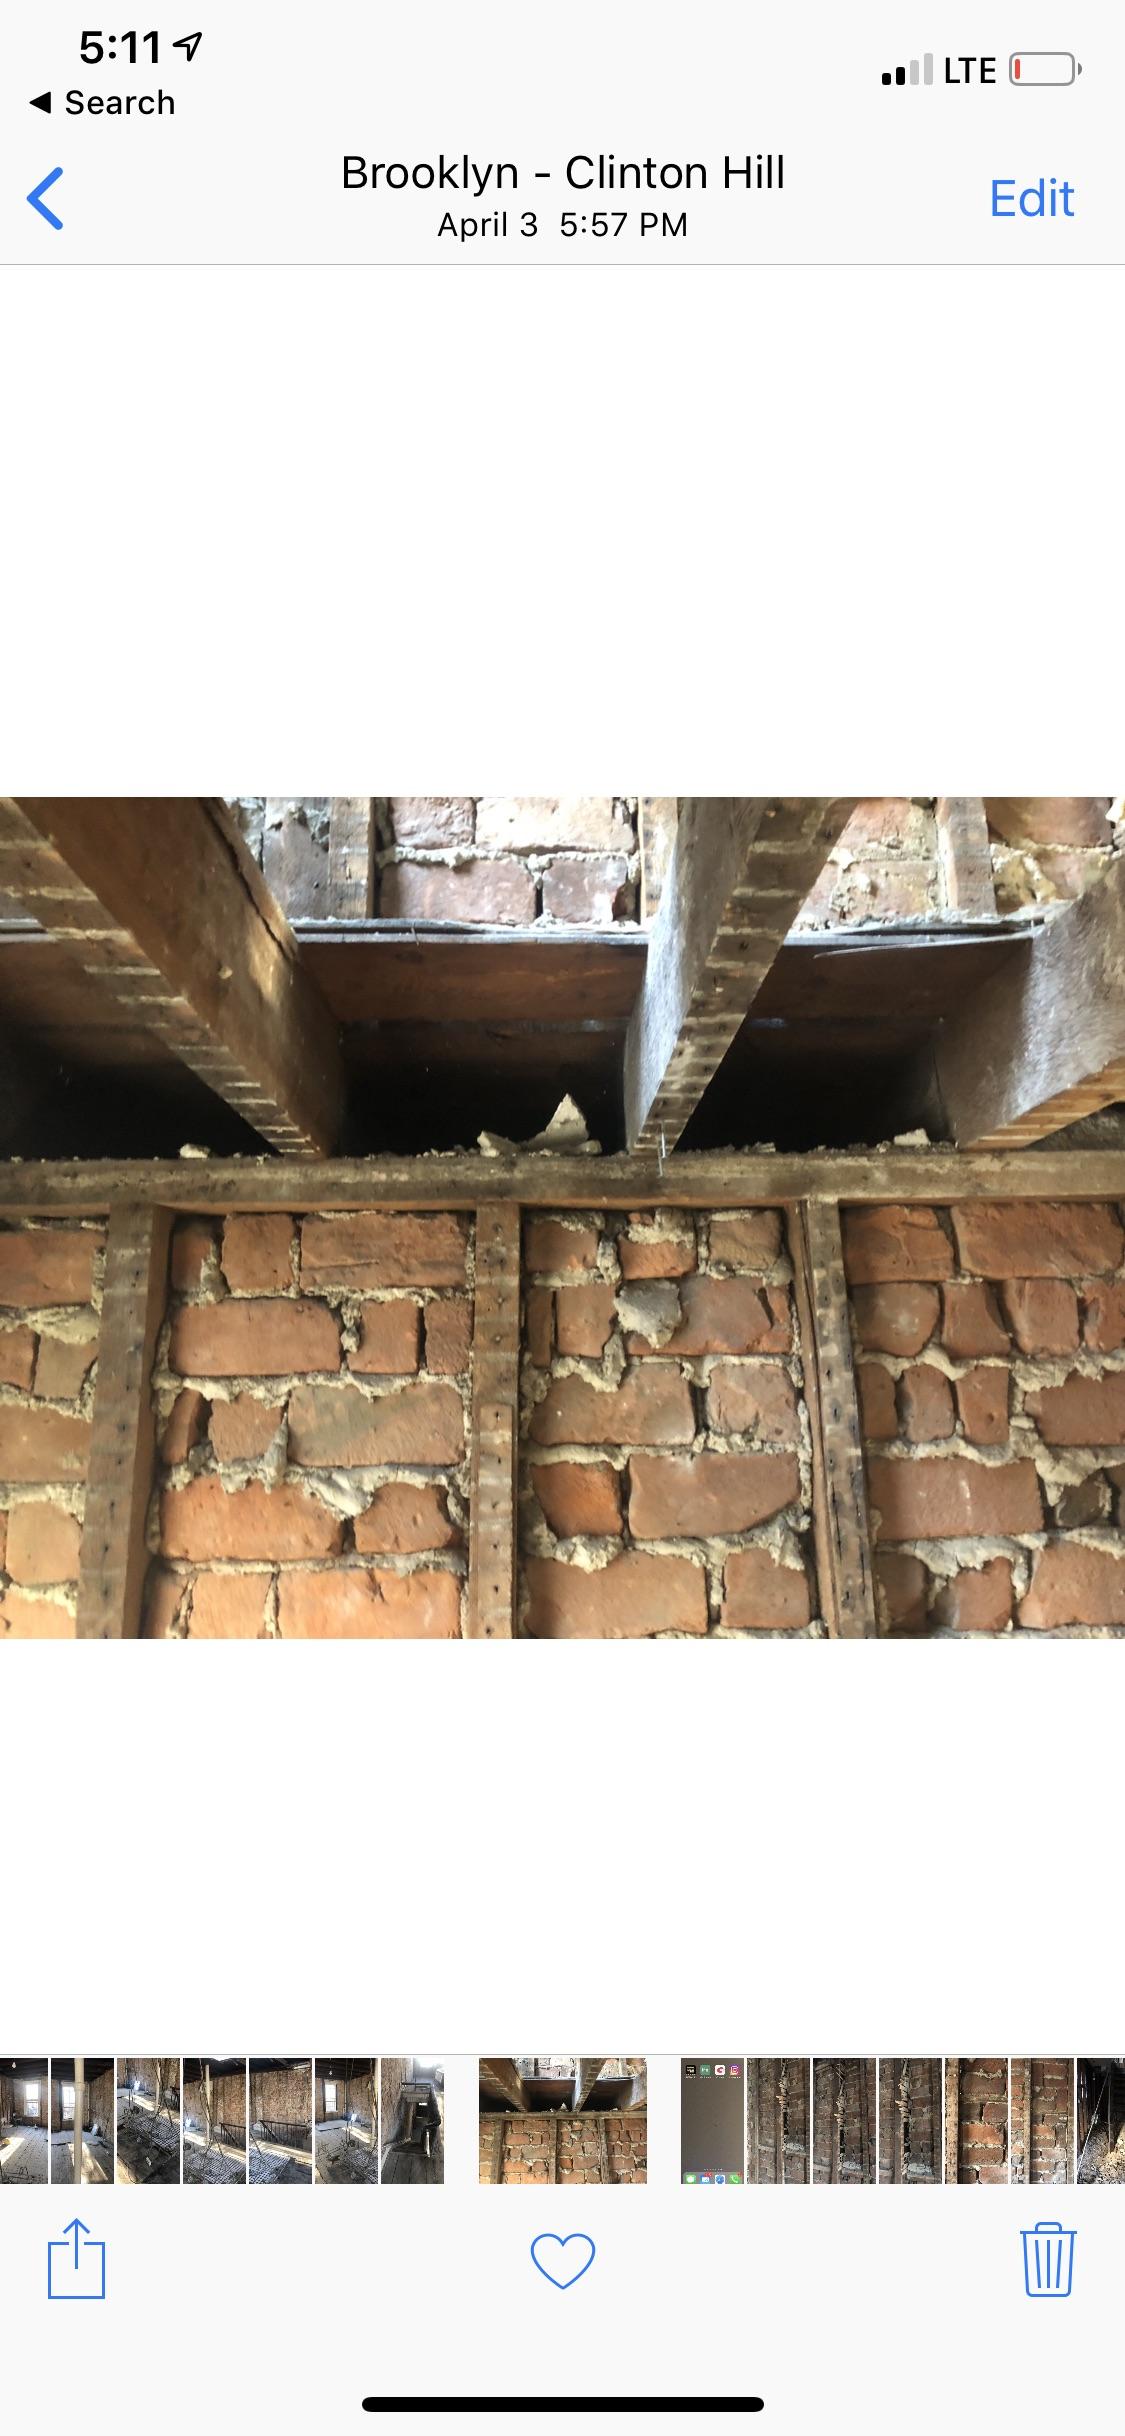 Brooklyn Historic Home Masonry Question #2-b829125d-5af3-4069-b3b0-b1d9a41aa83e.jpeg